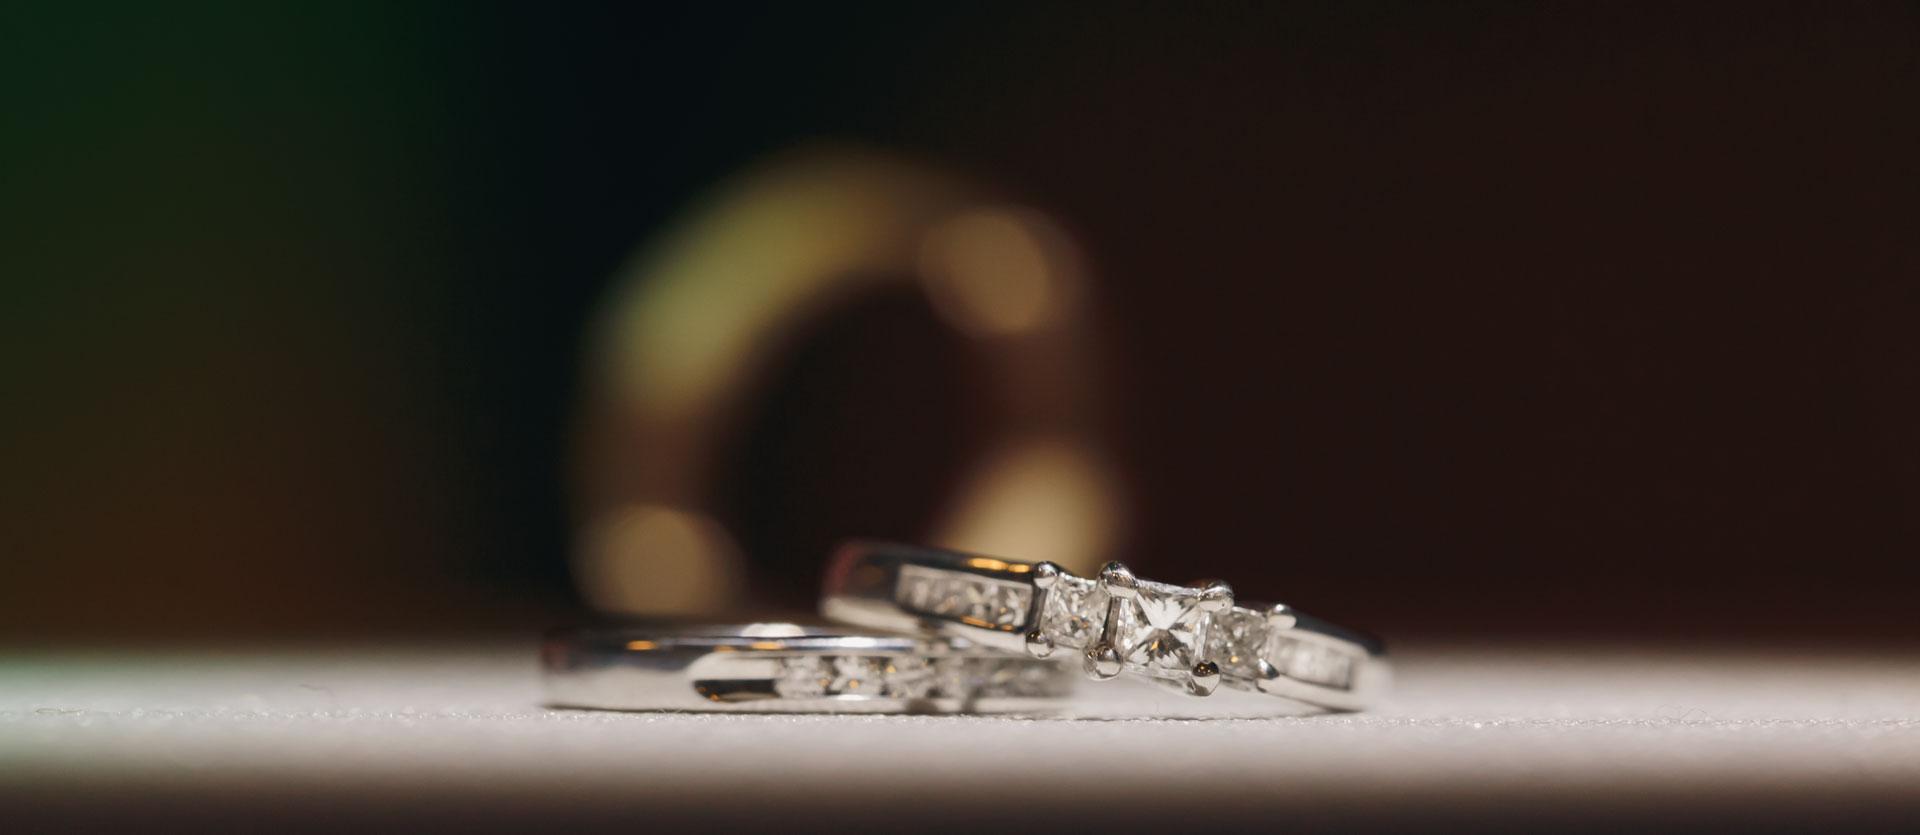 newton-rings